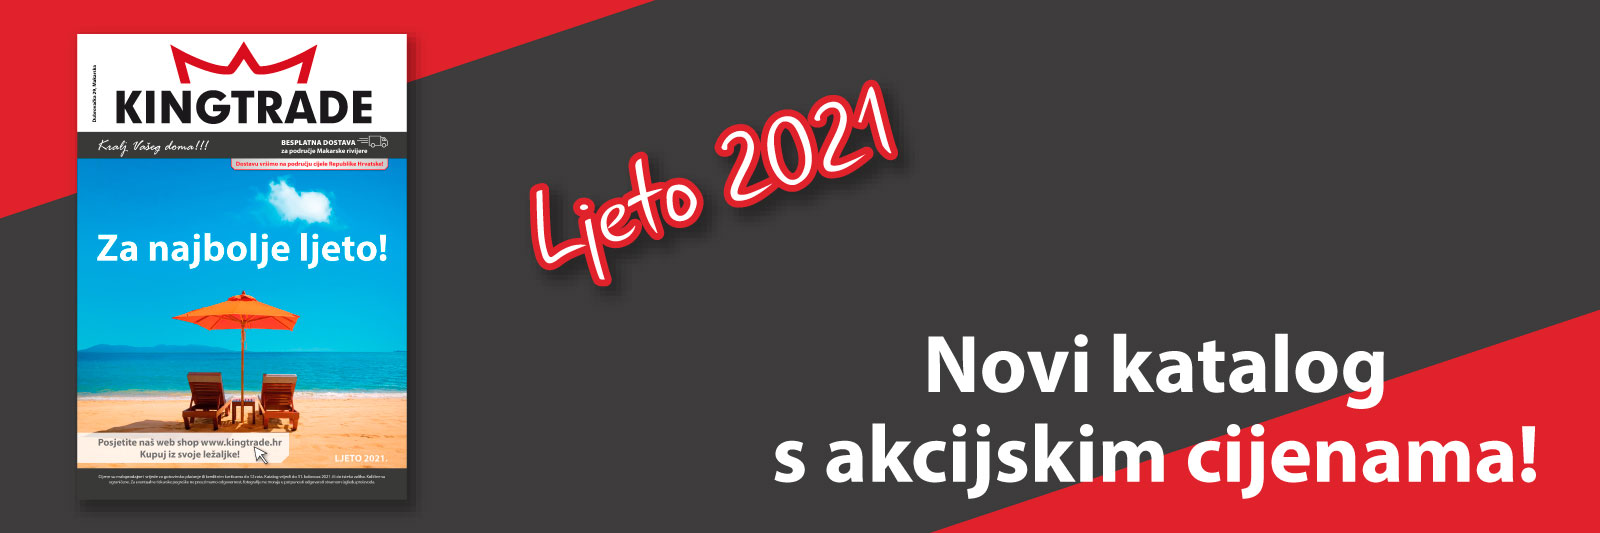 Katalog Ljeto 2021